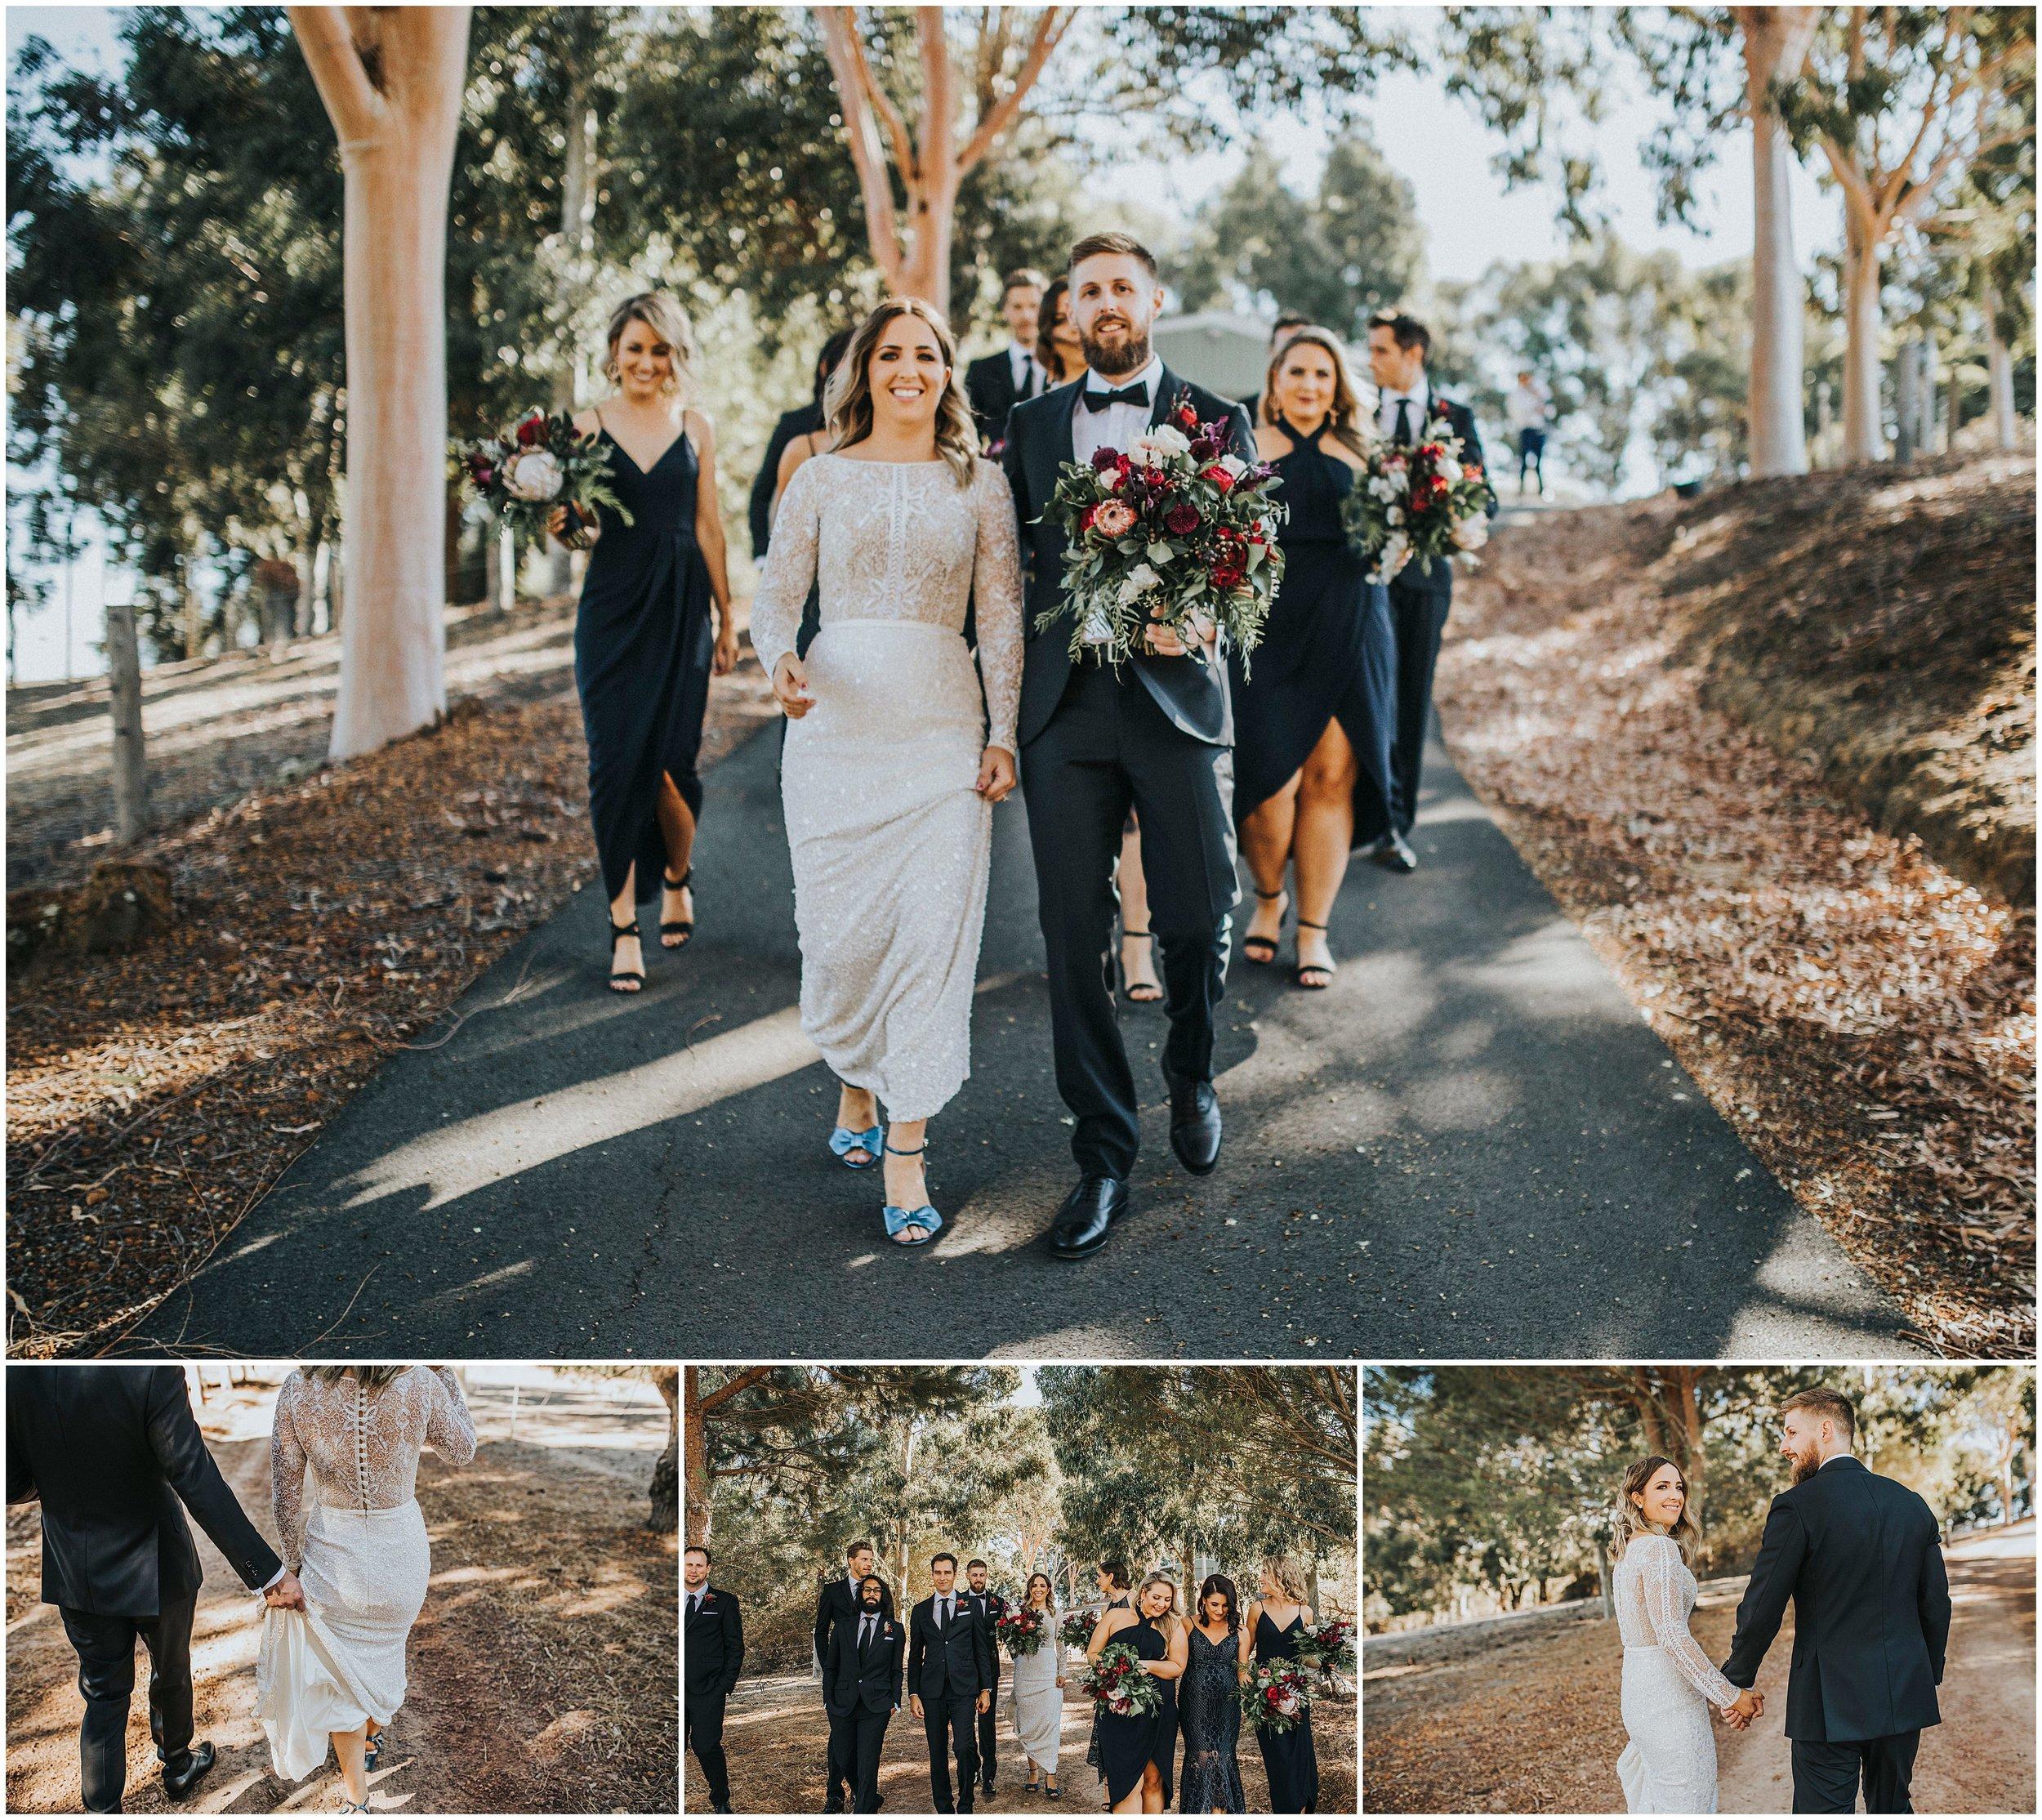 ferguson_valley_perth_wedding_photgorapher_keeper_creative_11.JPG